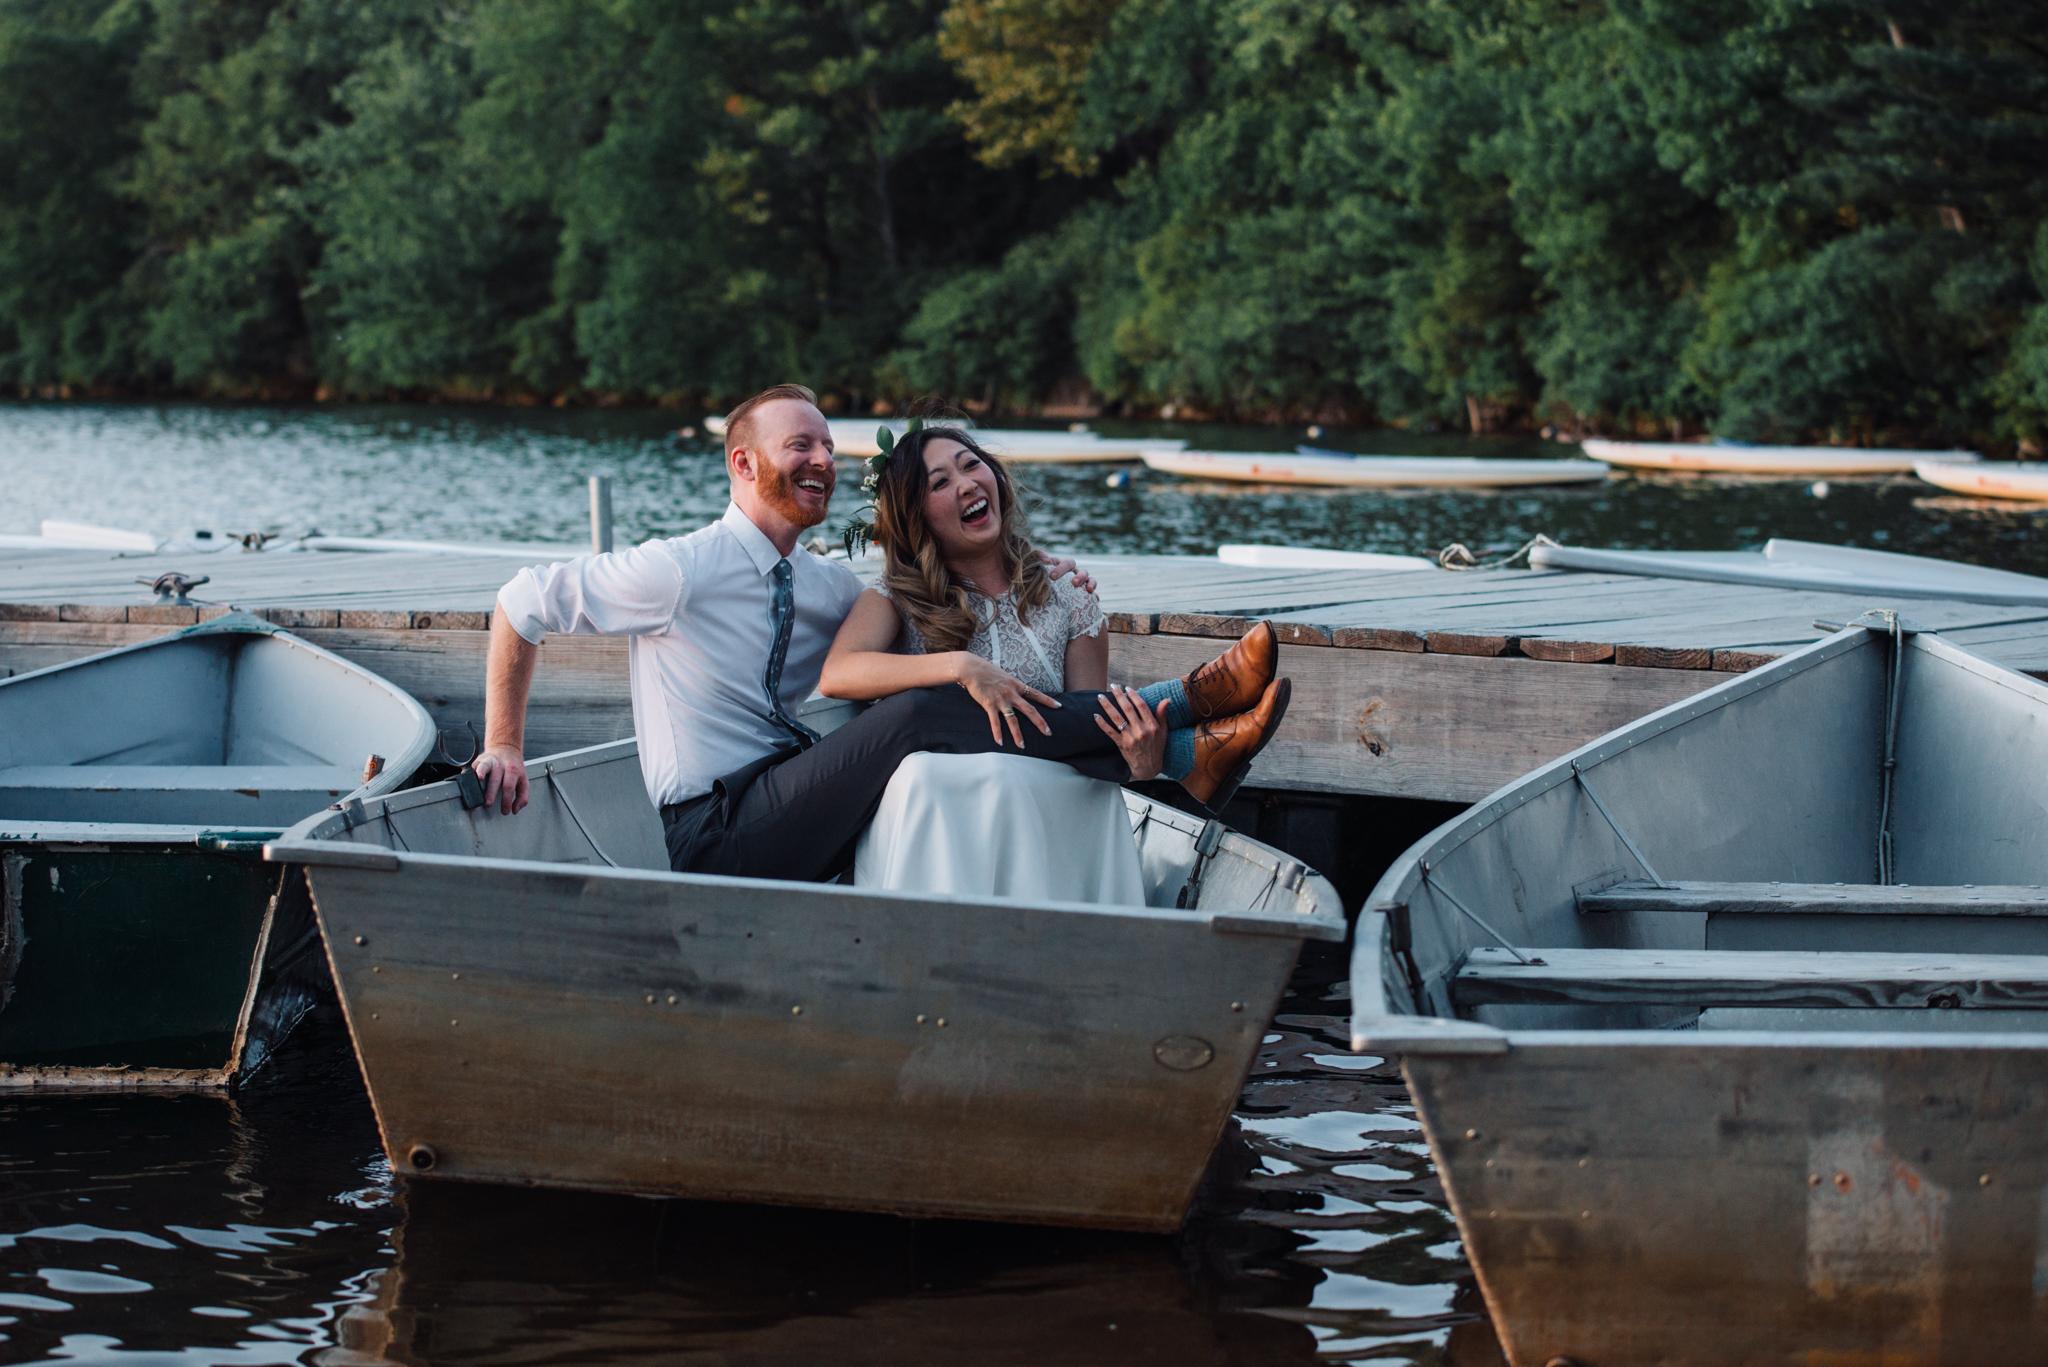 Summer Camp Wedding Photography June 2017 Massachusetts Berkshires Outdoor Wedding Photography Novella Photography Matt and Paulette Griswold (173).jpg